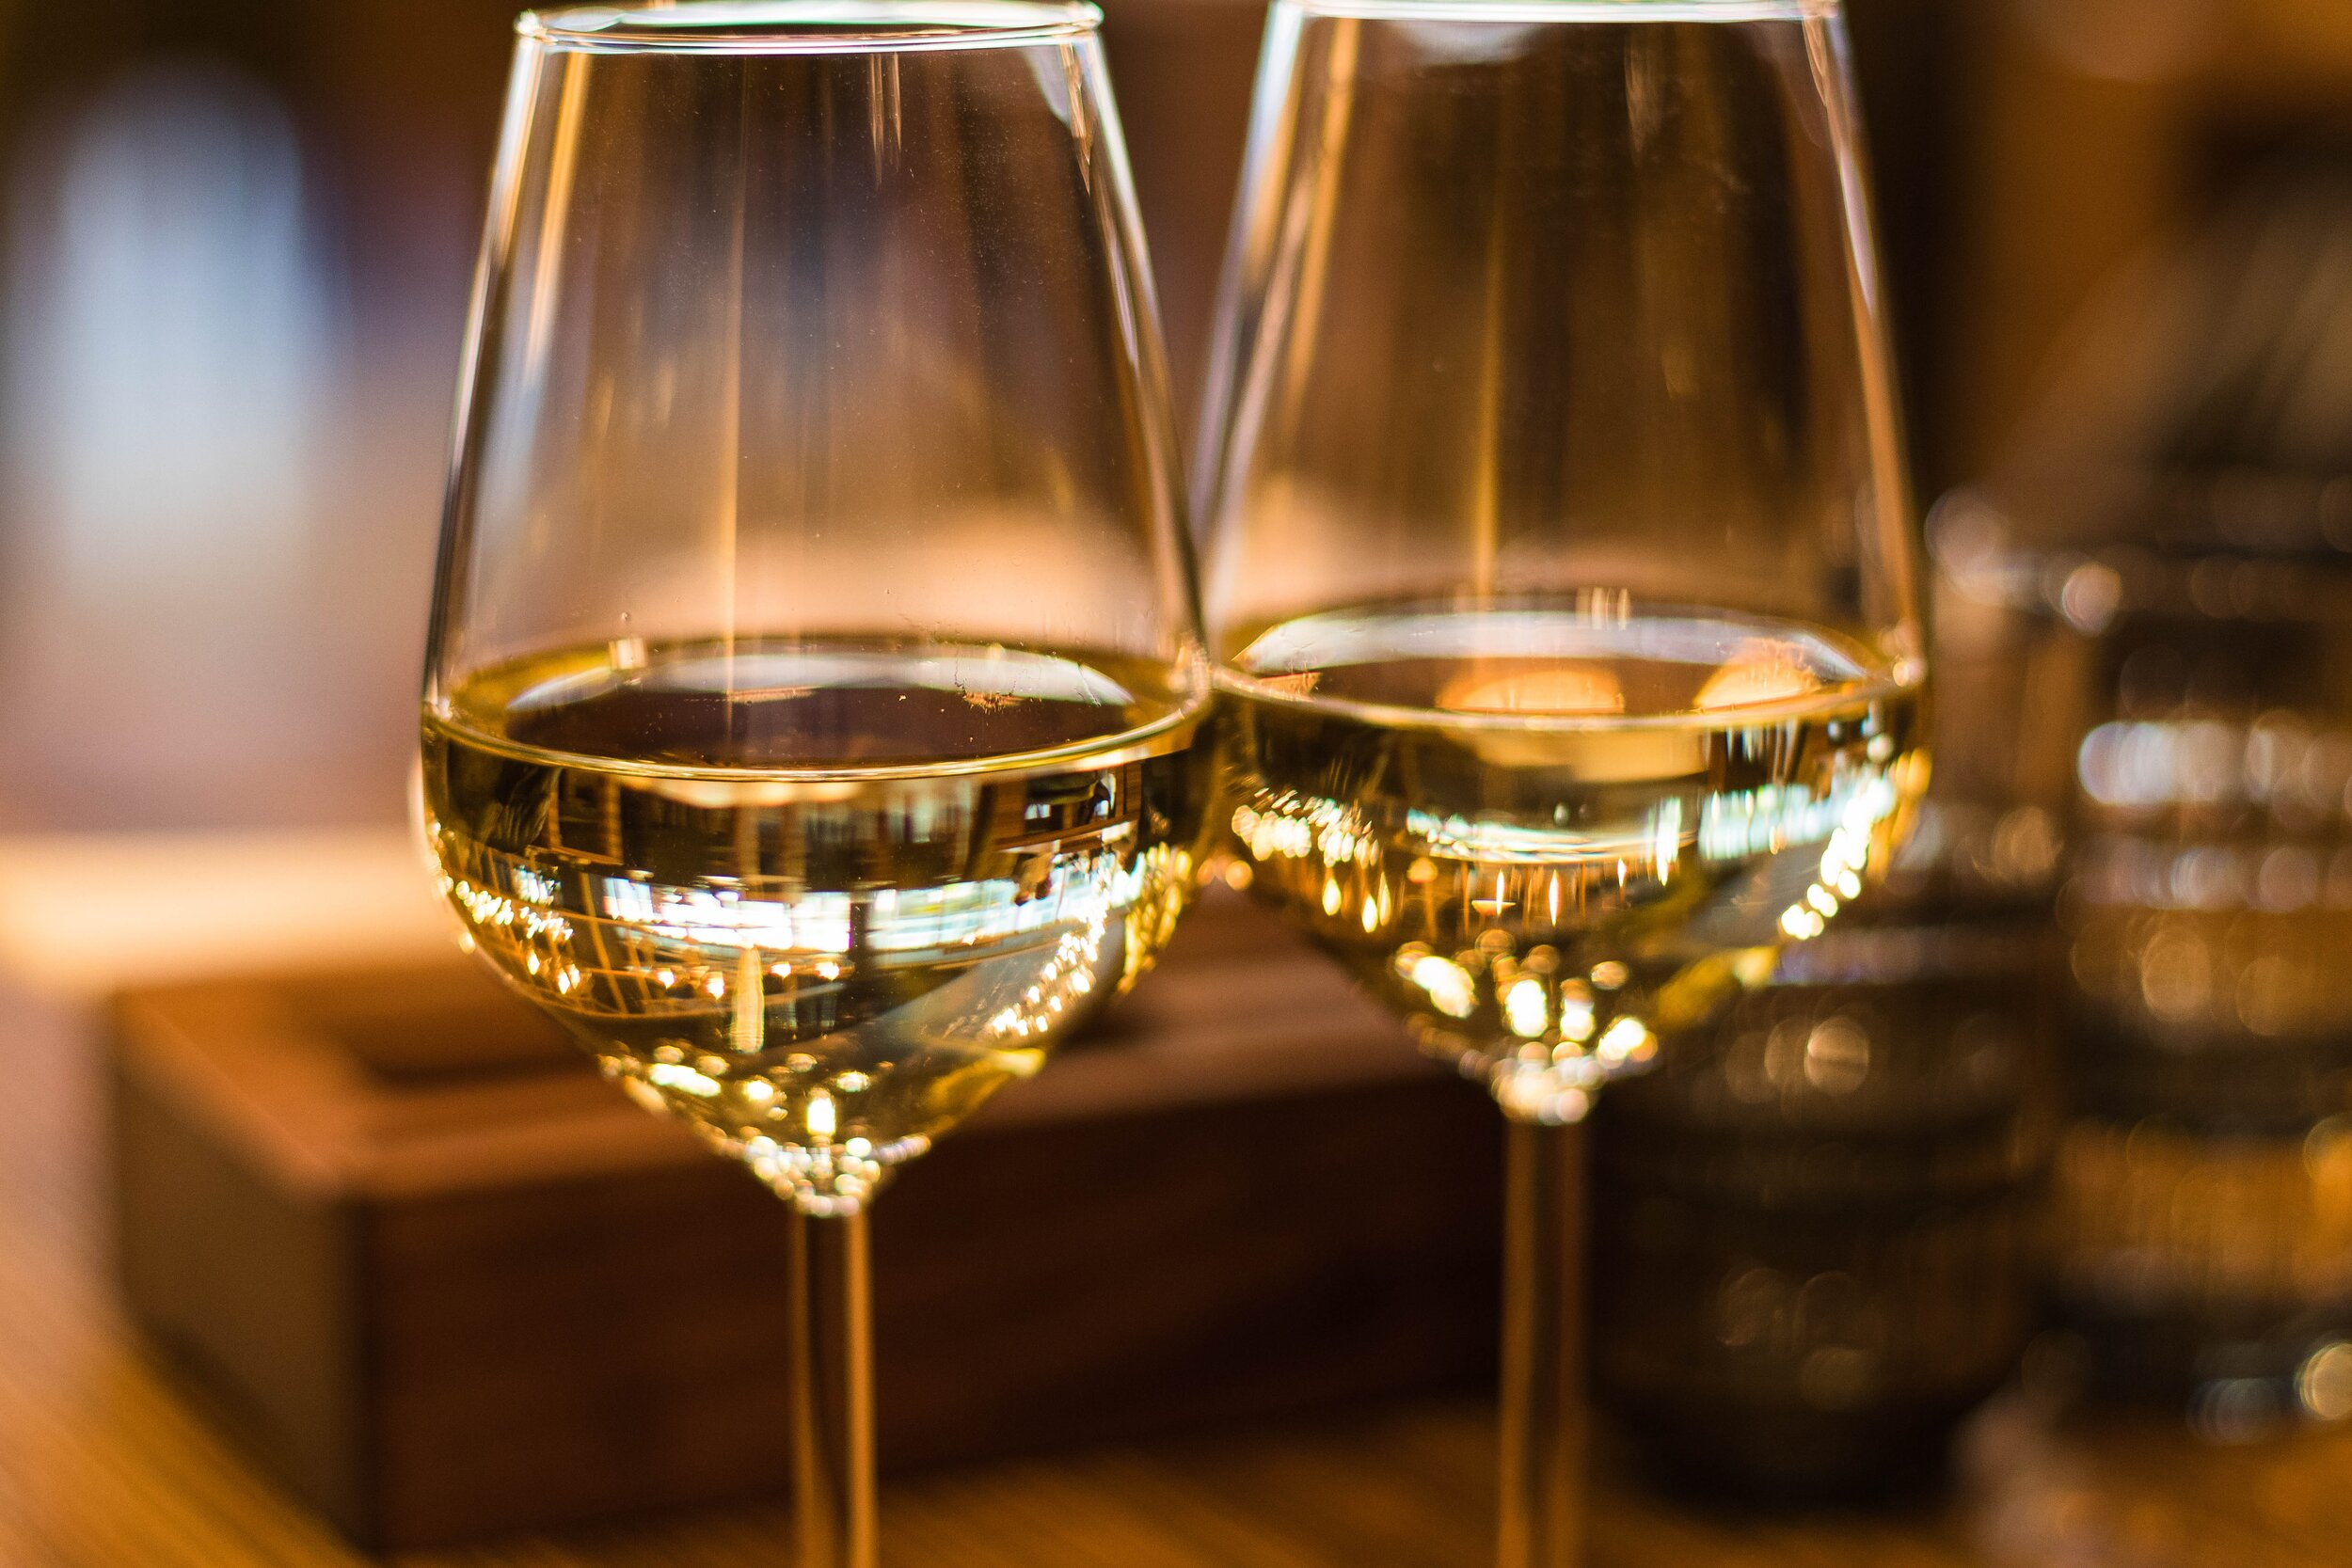 alcoholic-beverage-beverage-blur-1123260 (2).jpg